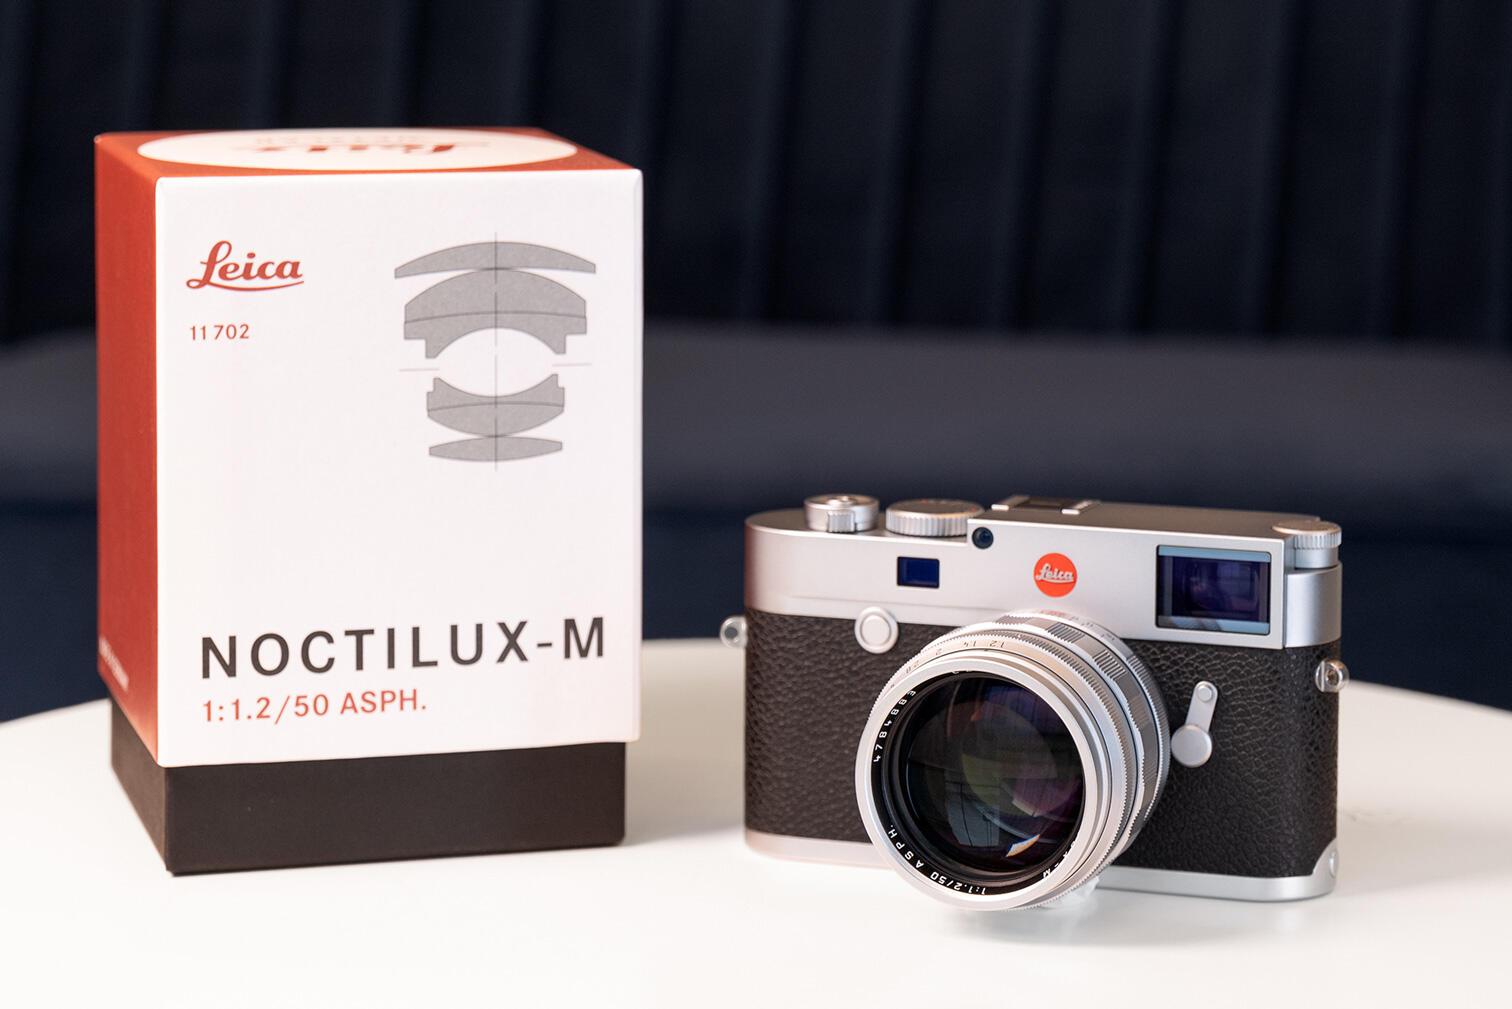 News: Leica stellt neues Objektiv vor - Leica Noctilux-M 1:1.2/50 ASPH.